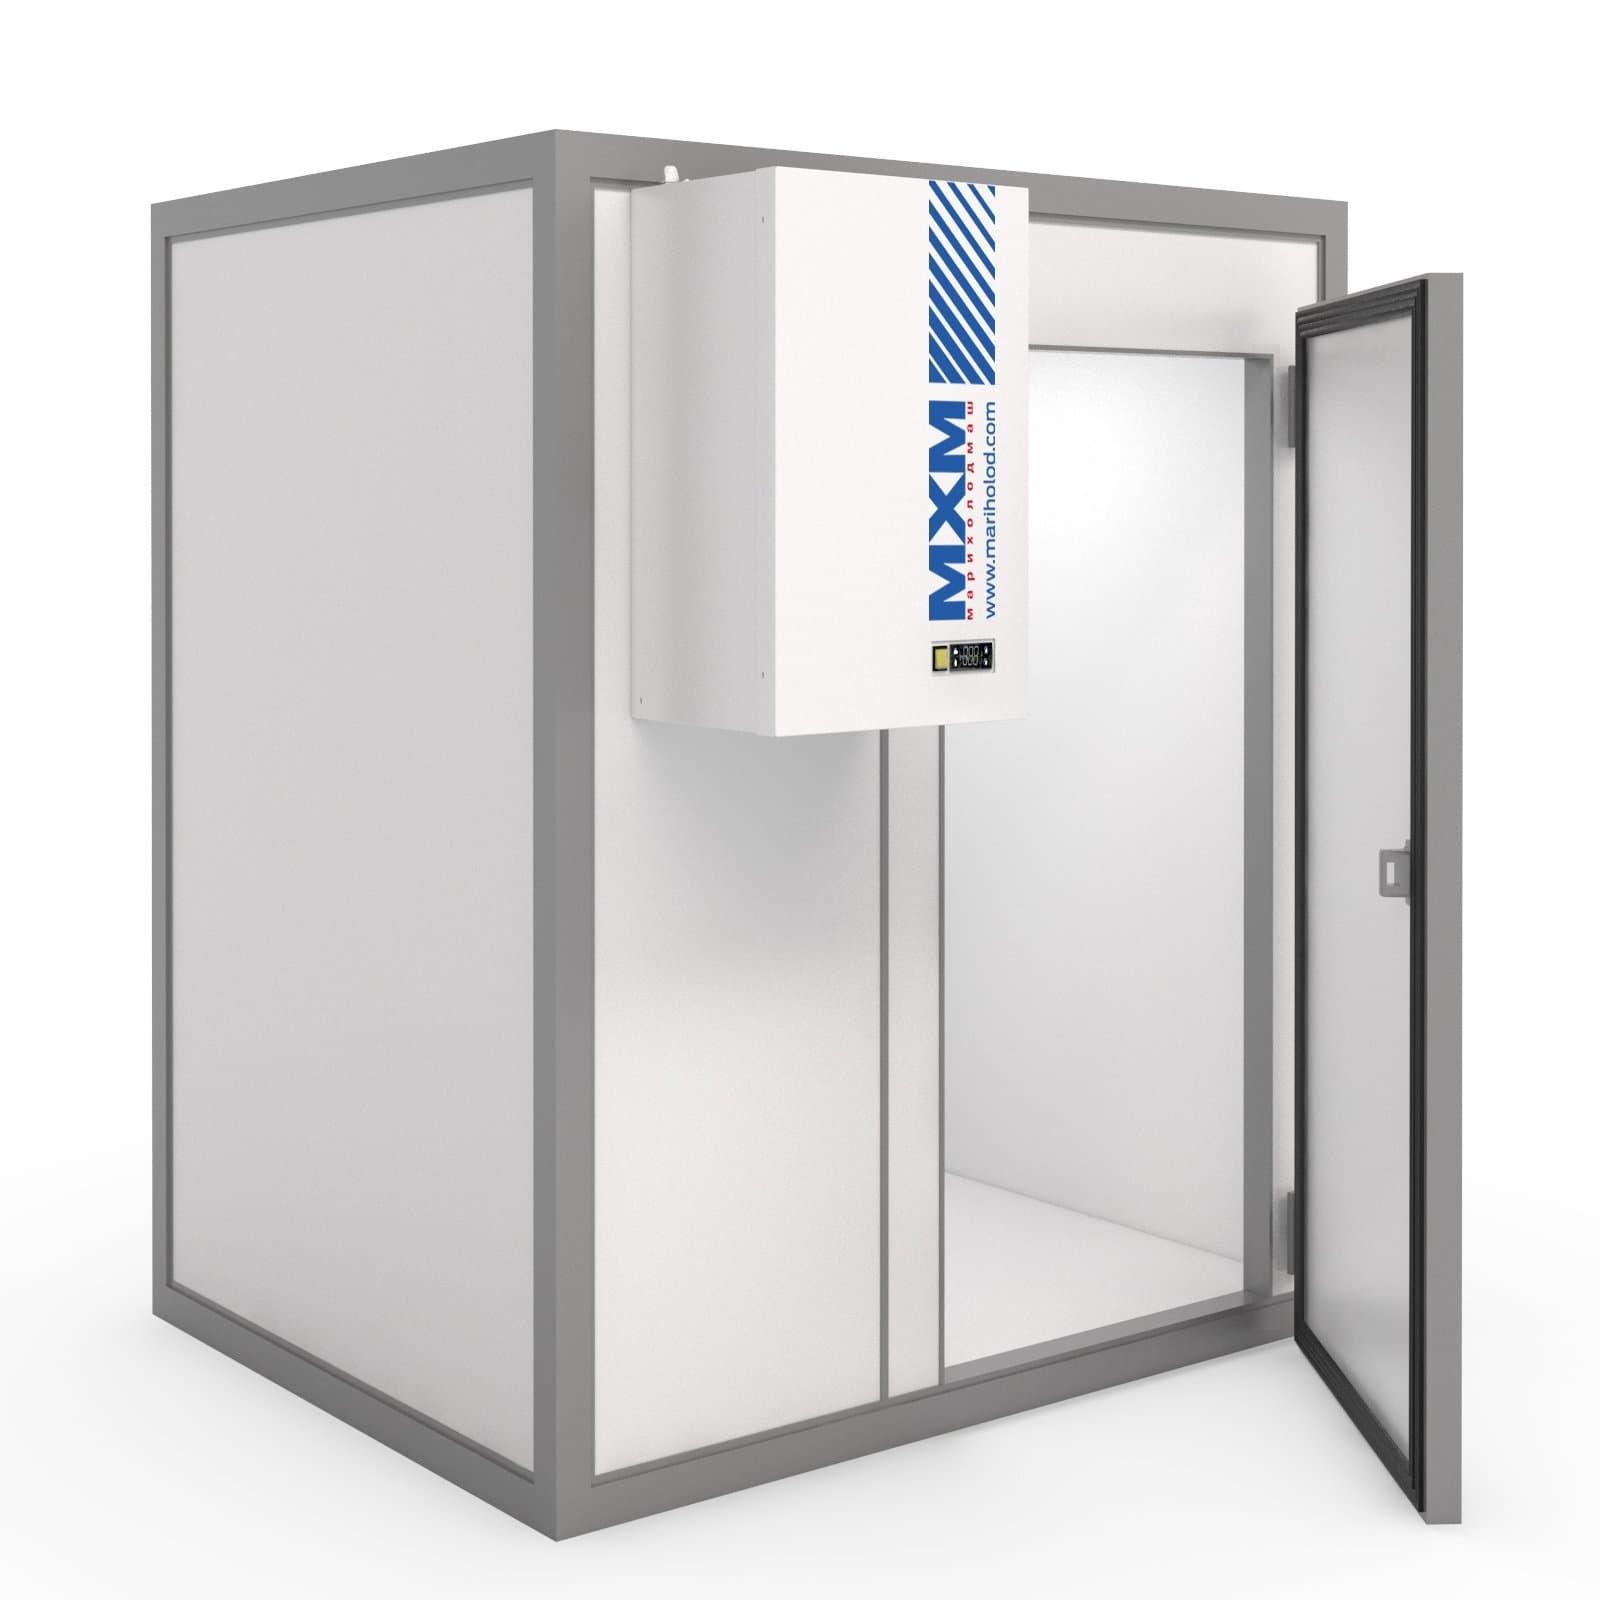 Камера холодильная МХМ КХН-79,68 2260×18460×2200